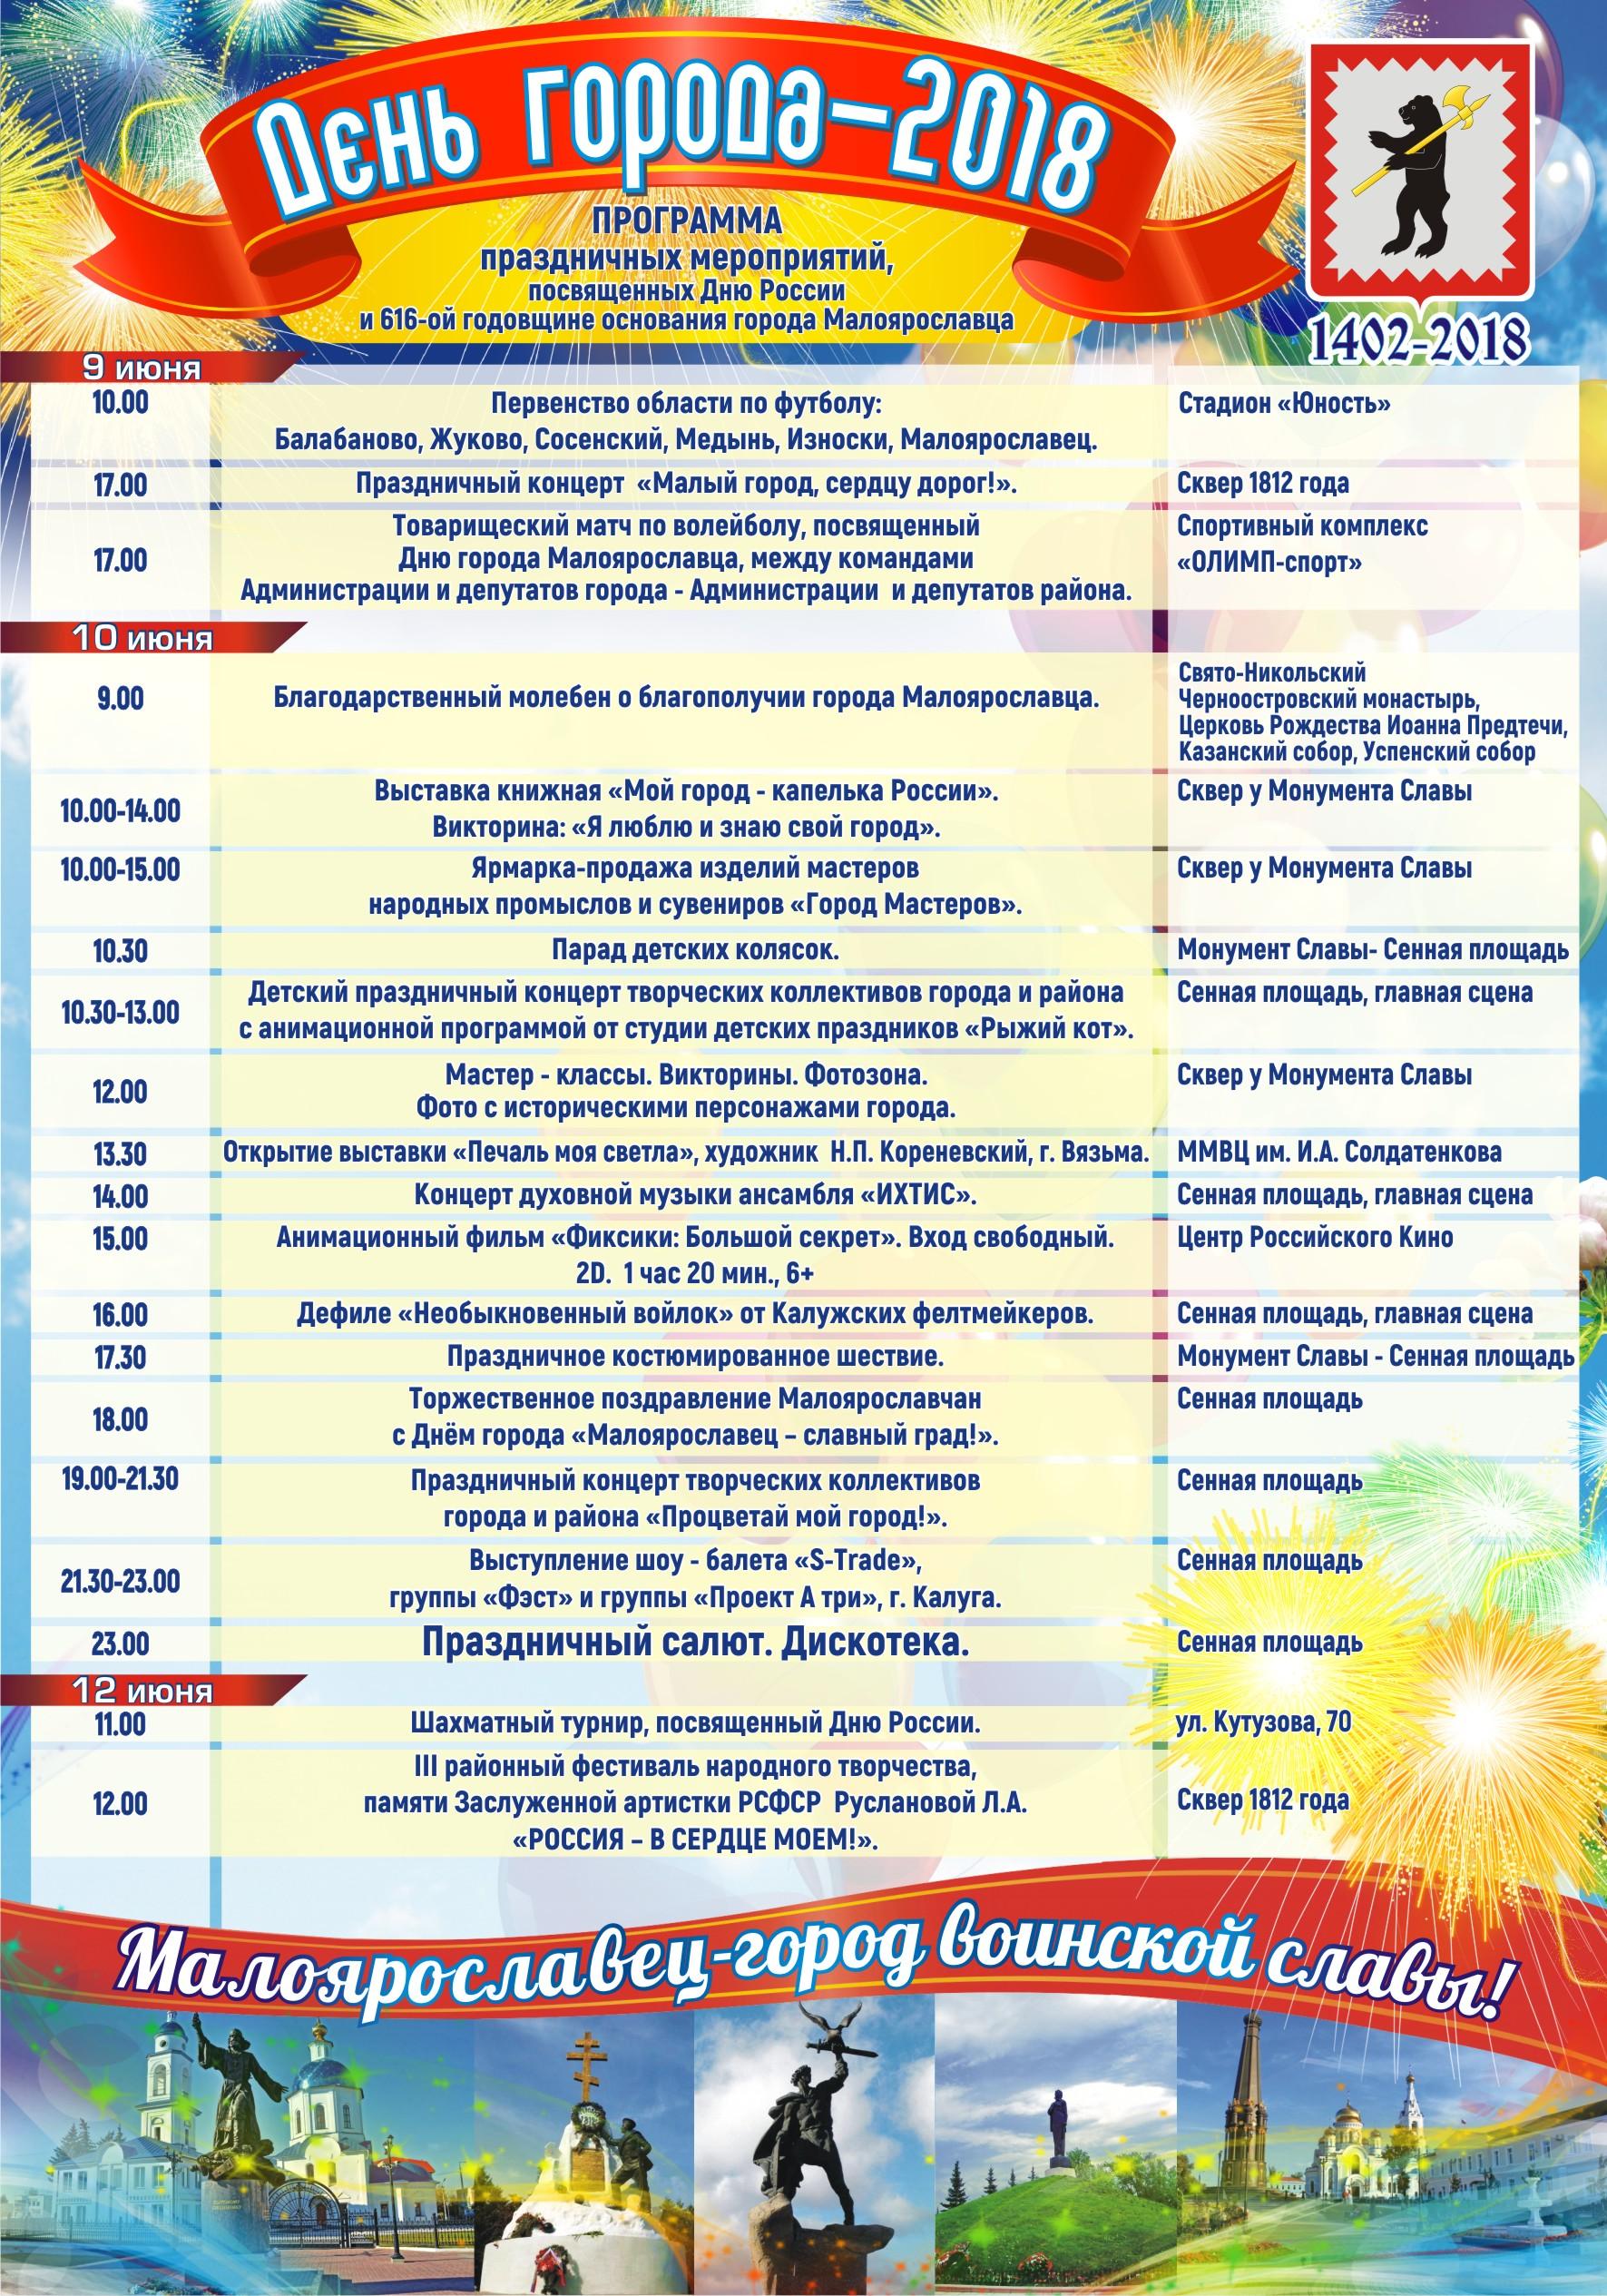 День города Малоярославец 10 июня 2018 года – программа мероприятий, когда салют